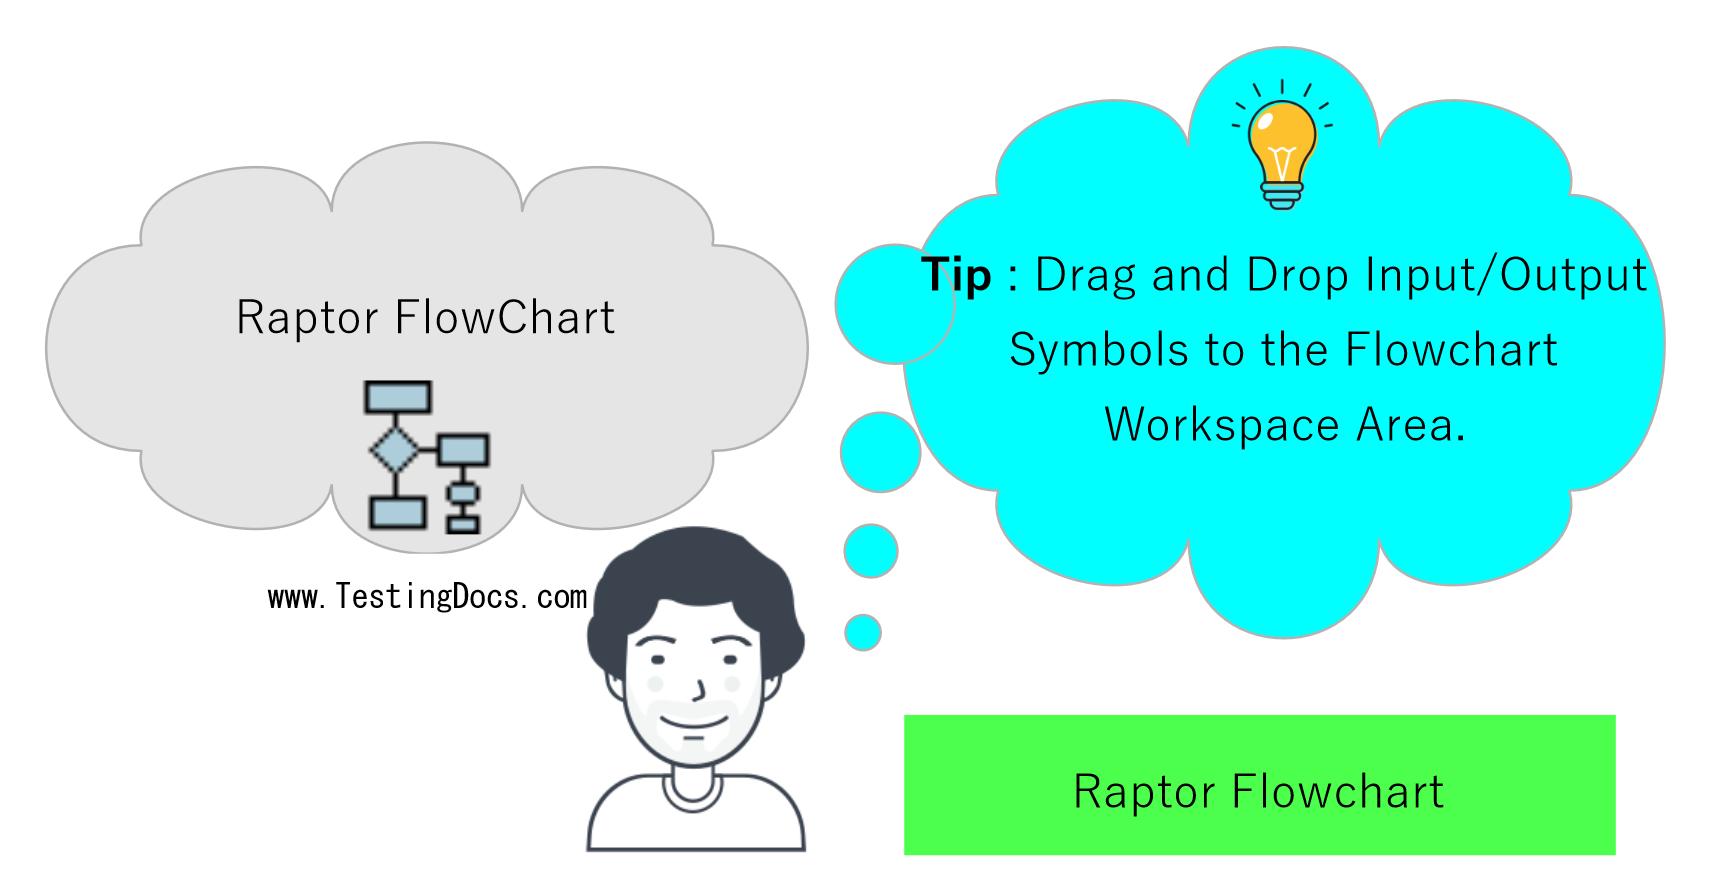 Raptor-Flowchart-Input-Output-Symbols-